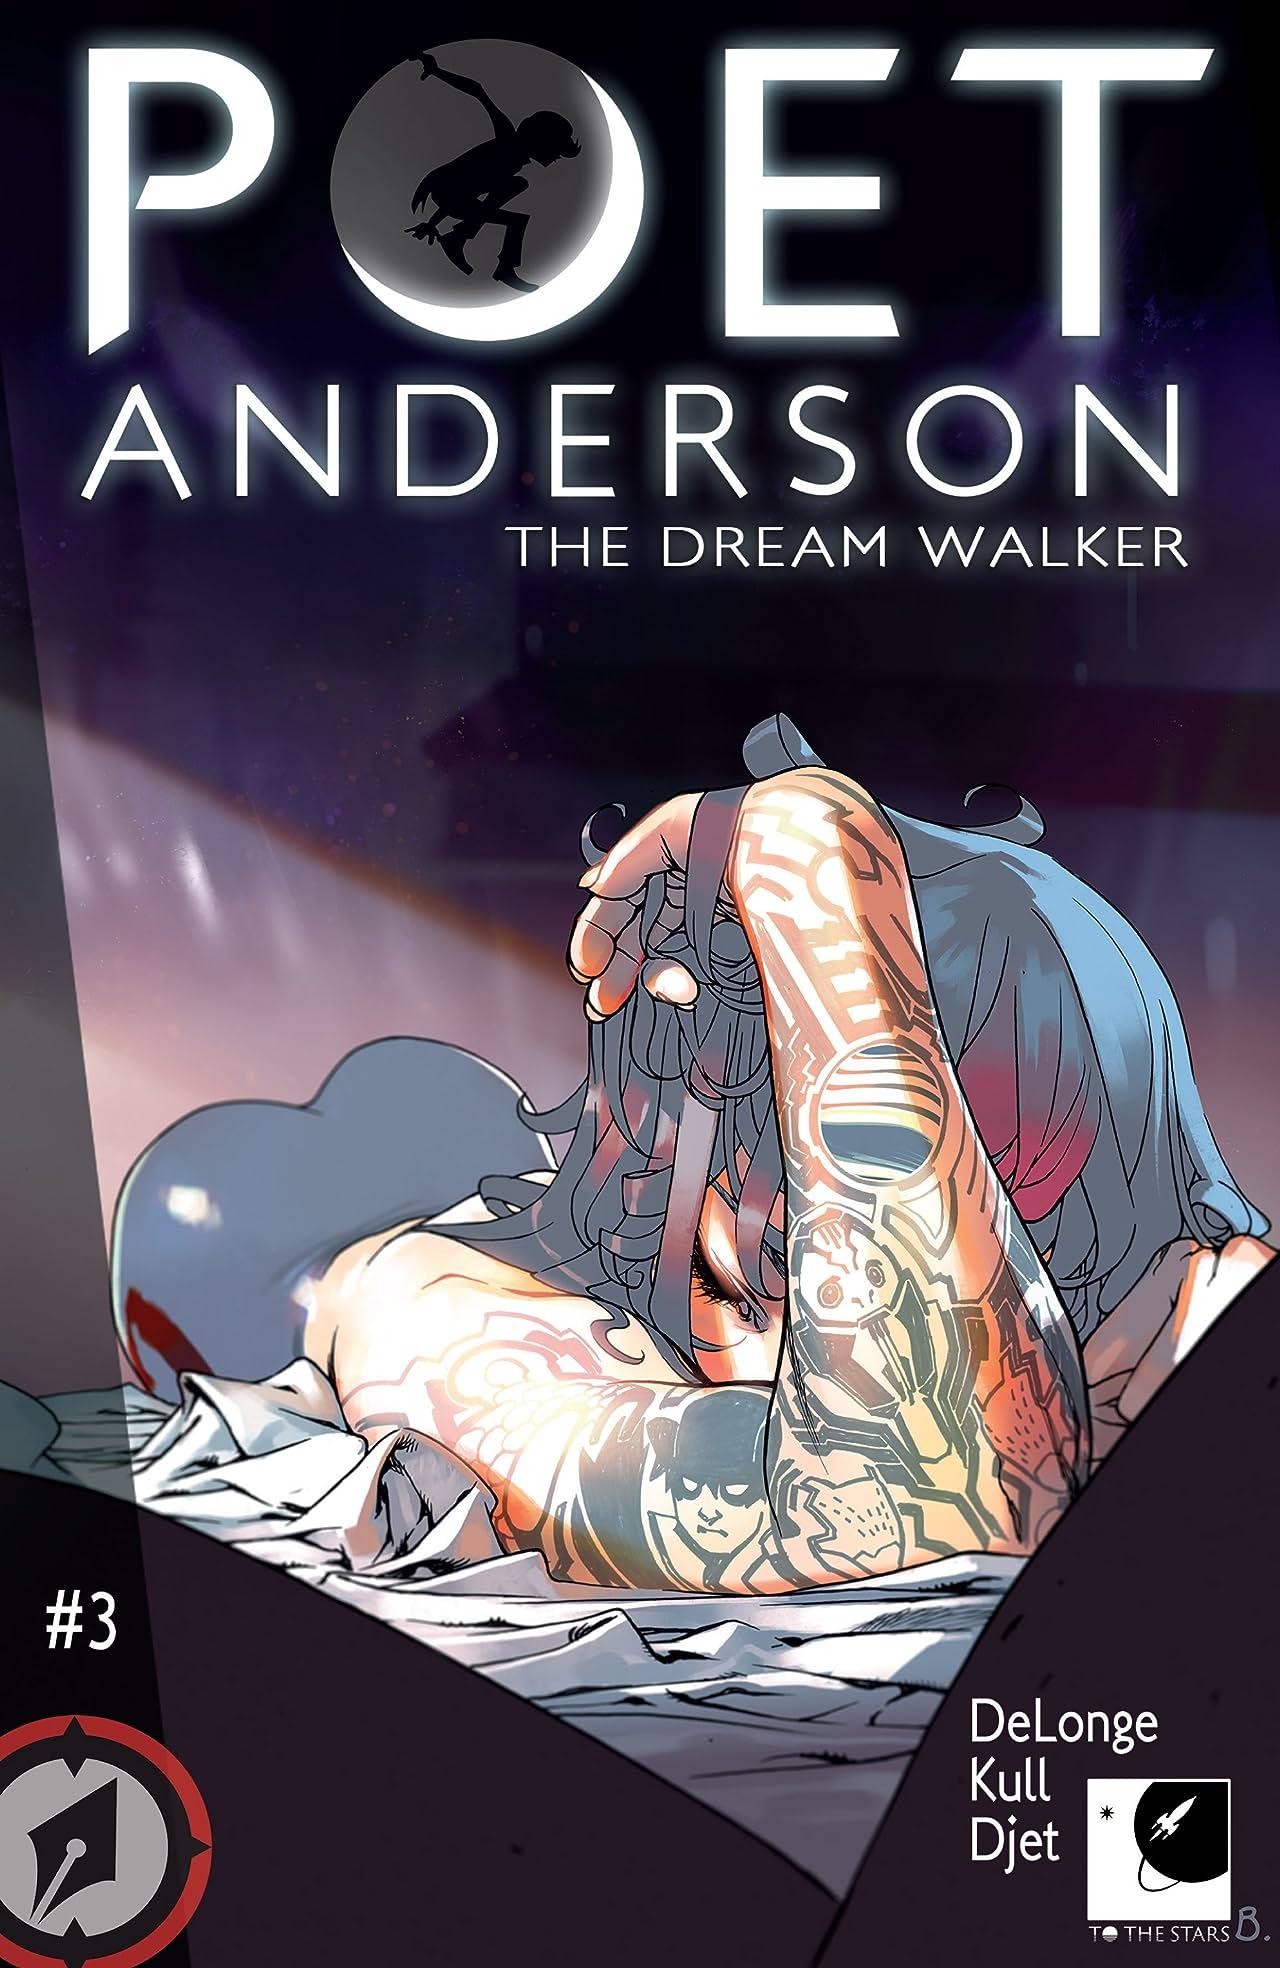 Poet Anderson: The Dream Walker #3